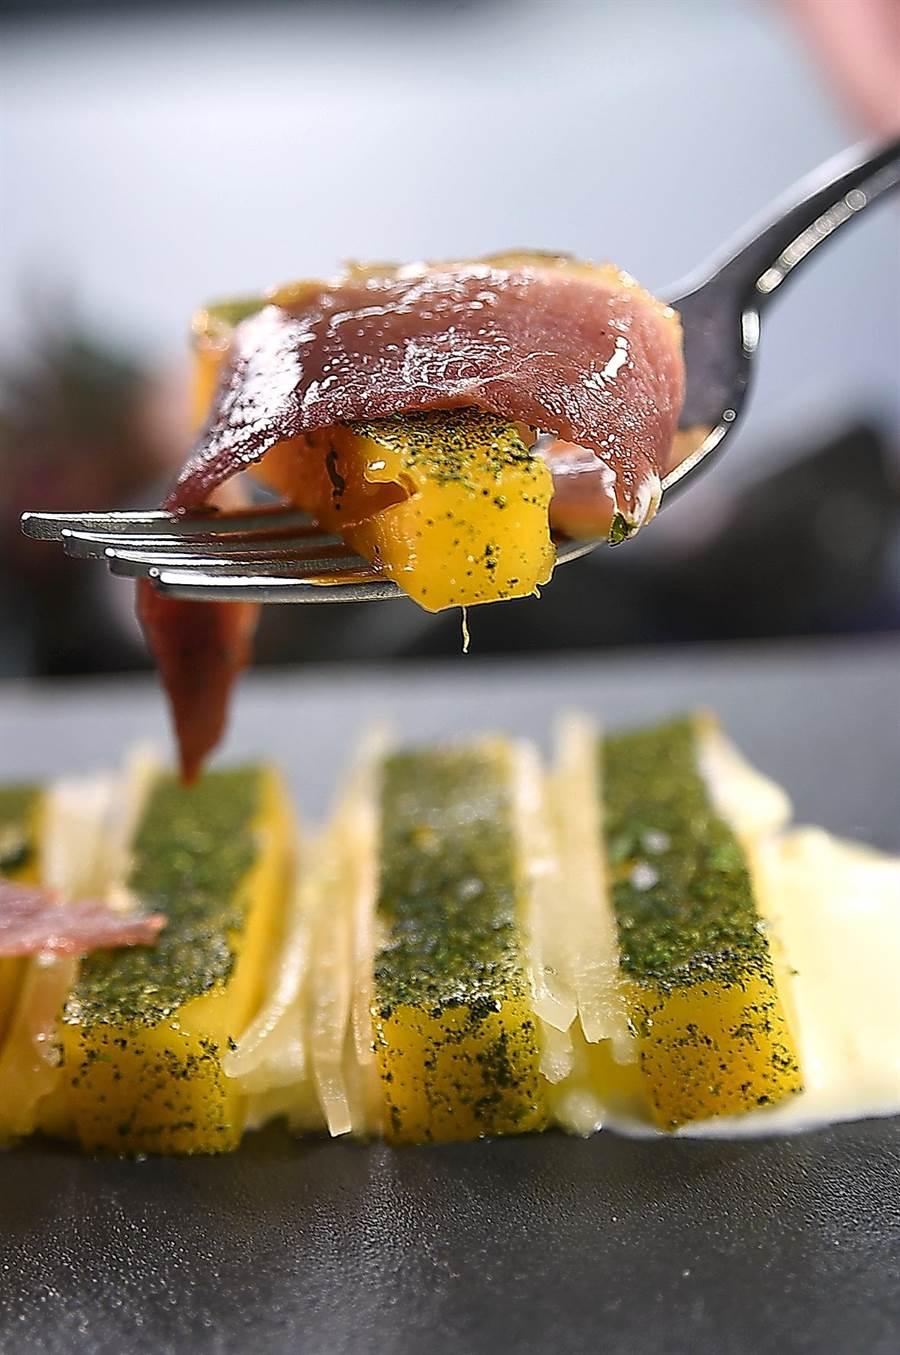 〈RAW〉的夏季新菜〈蔗燻鴨賞/烏香芒果/芝麻葉〉,堪稱「台灣版的Jamo'n de Jabugo」,食客可以Fine Food形式感受宜蘭風土。(圖/姚舜)